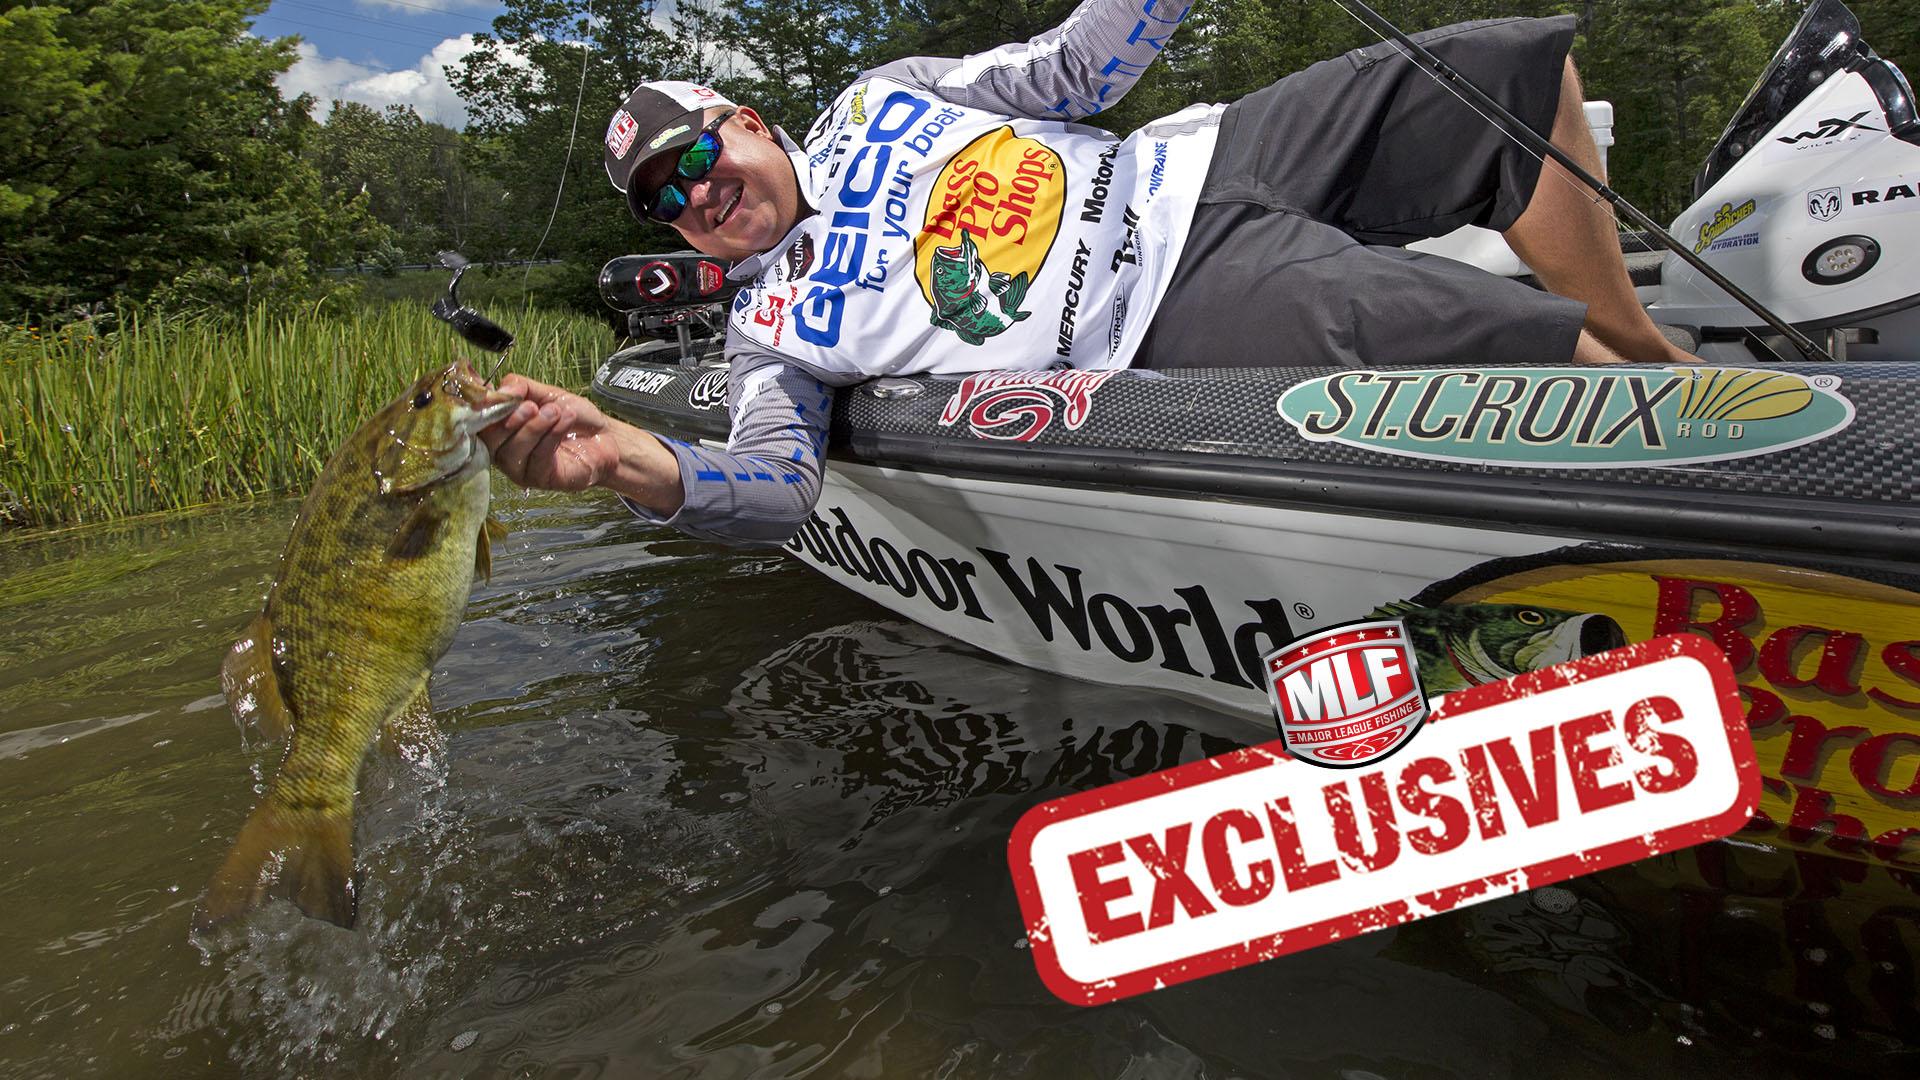 Major League Fishing Exclusives